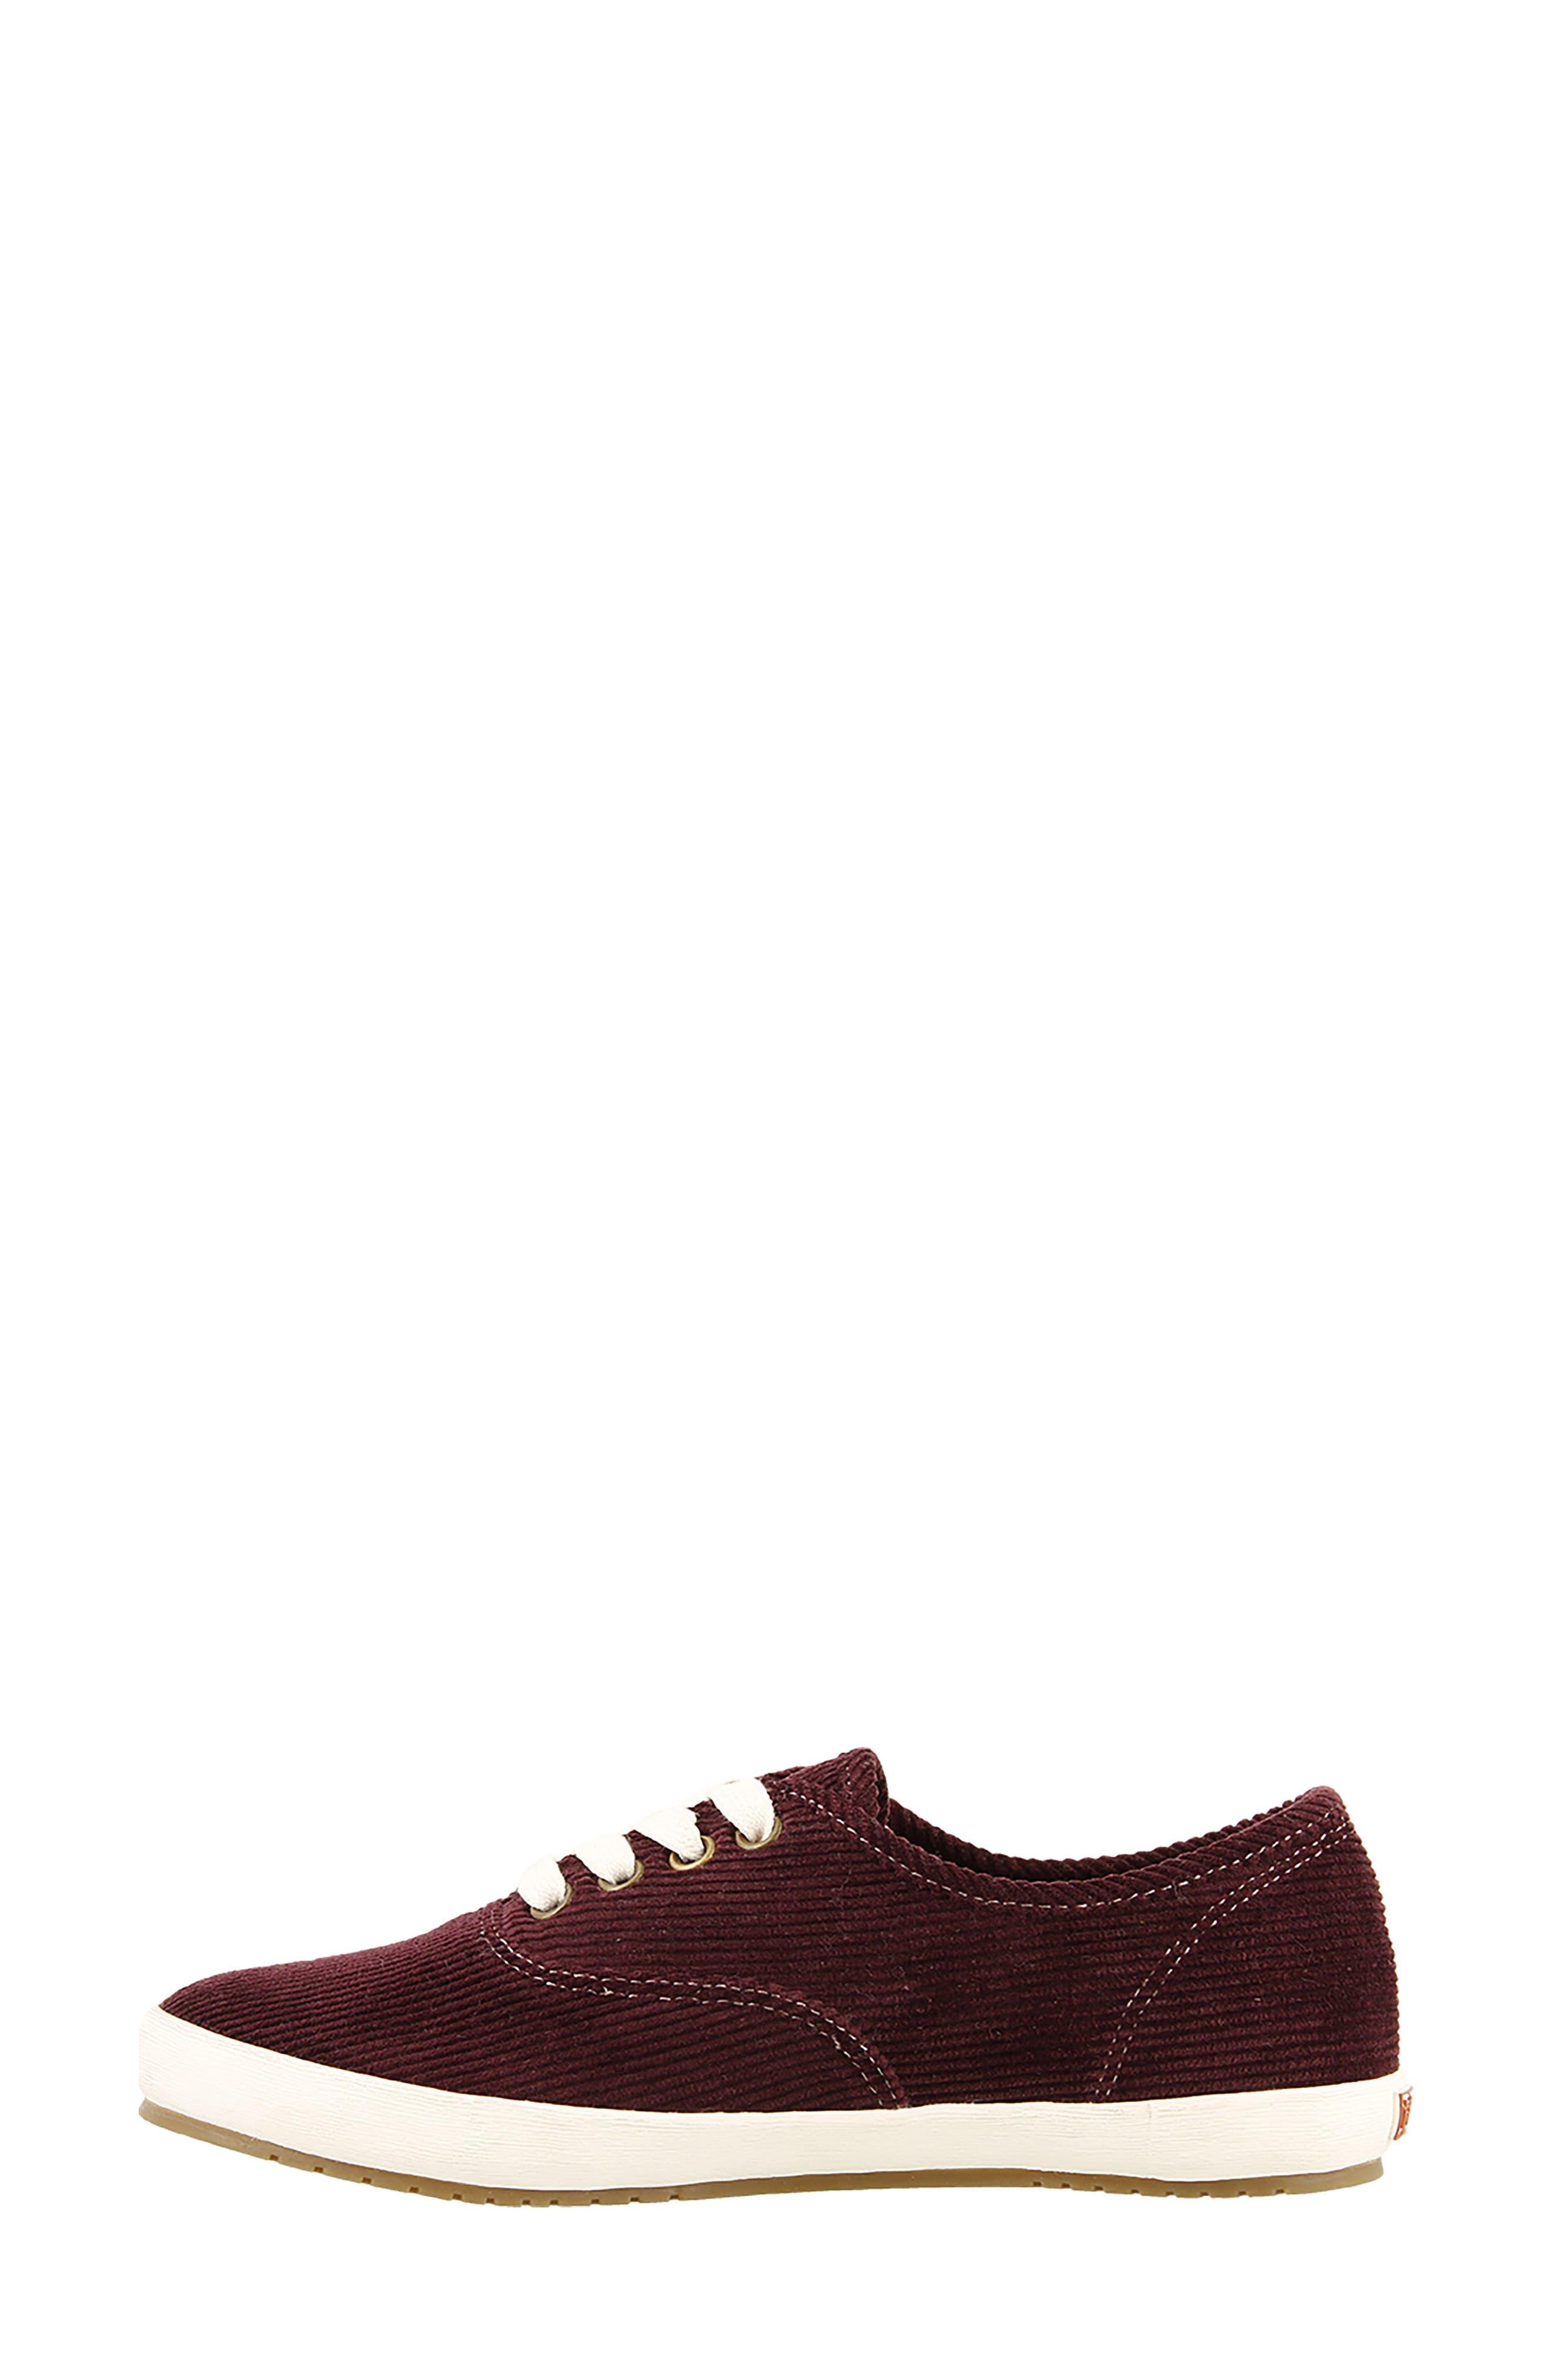 Guest Star Sneaker,                             Alternate thumbnail 4, color,                             Bordeaux Cord Fabric